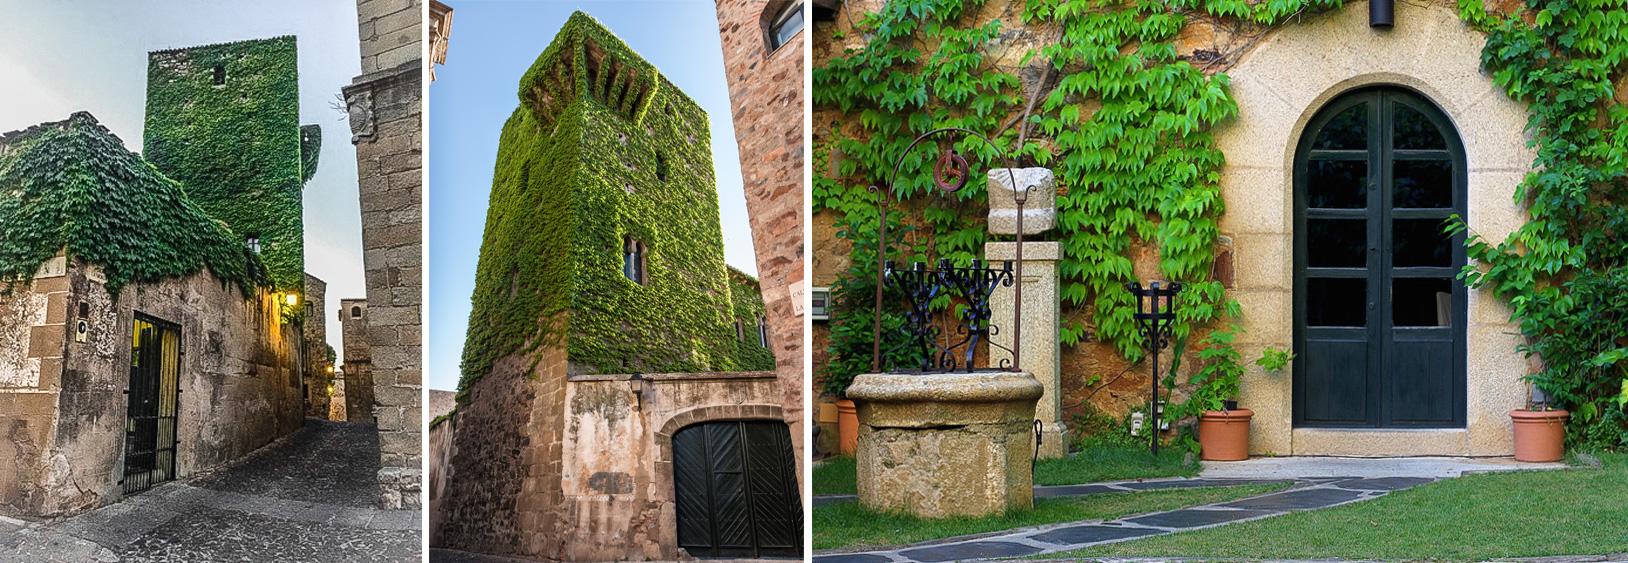 torre_de_sande_exterior